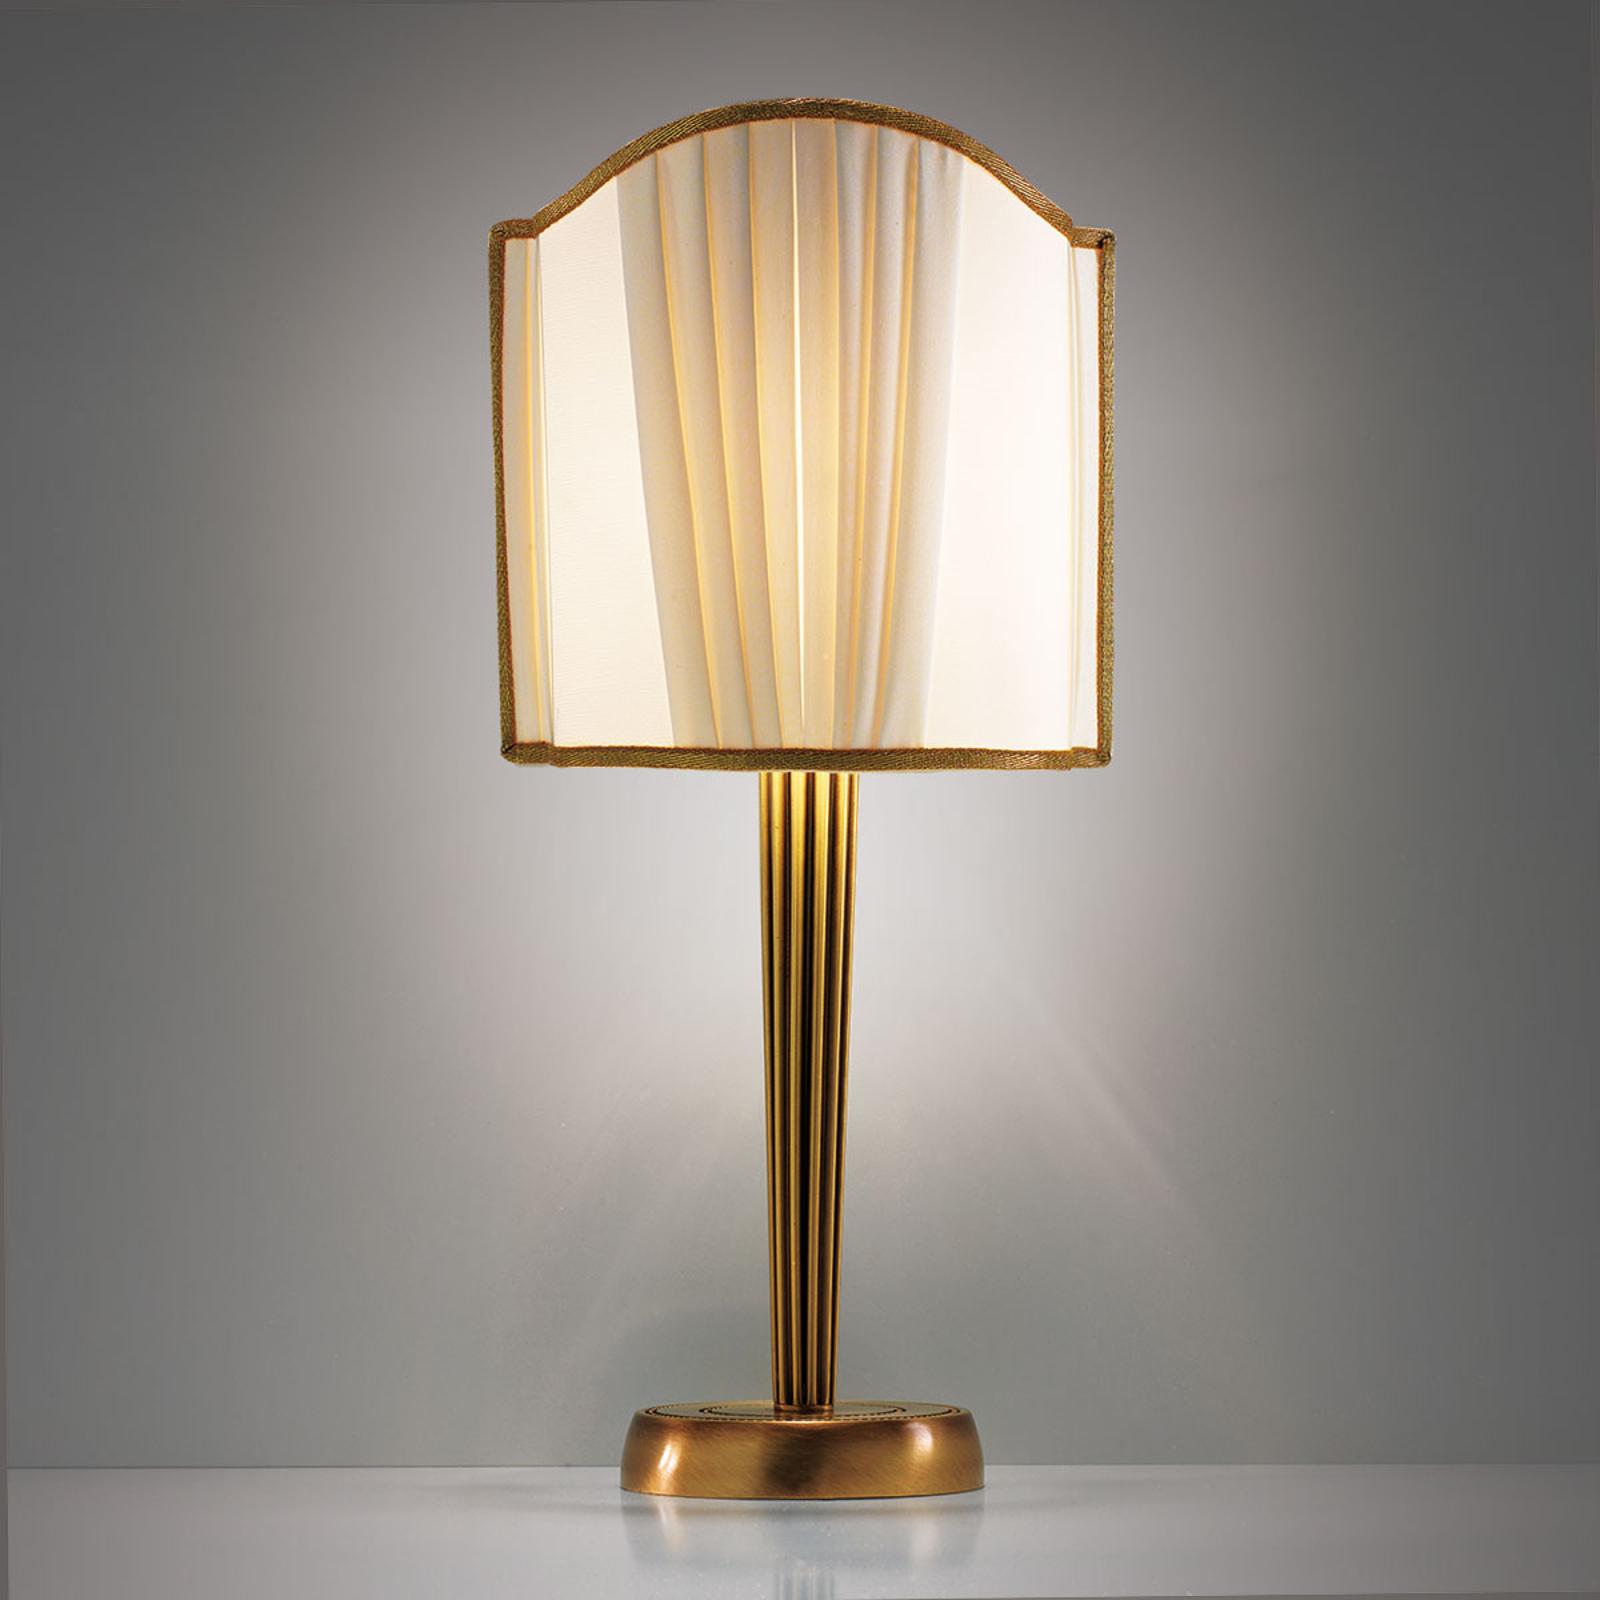 Vacker bordslampa Belle Epoque